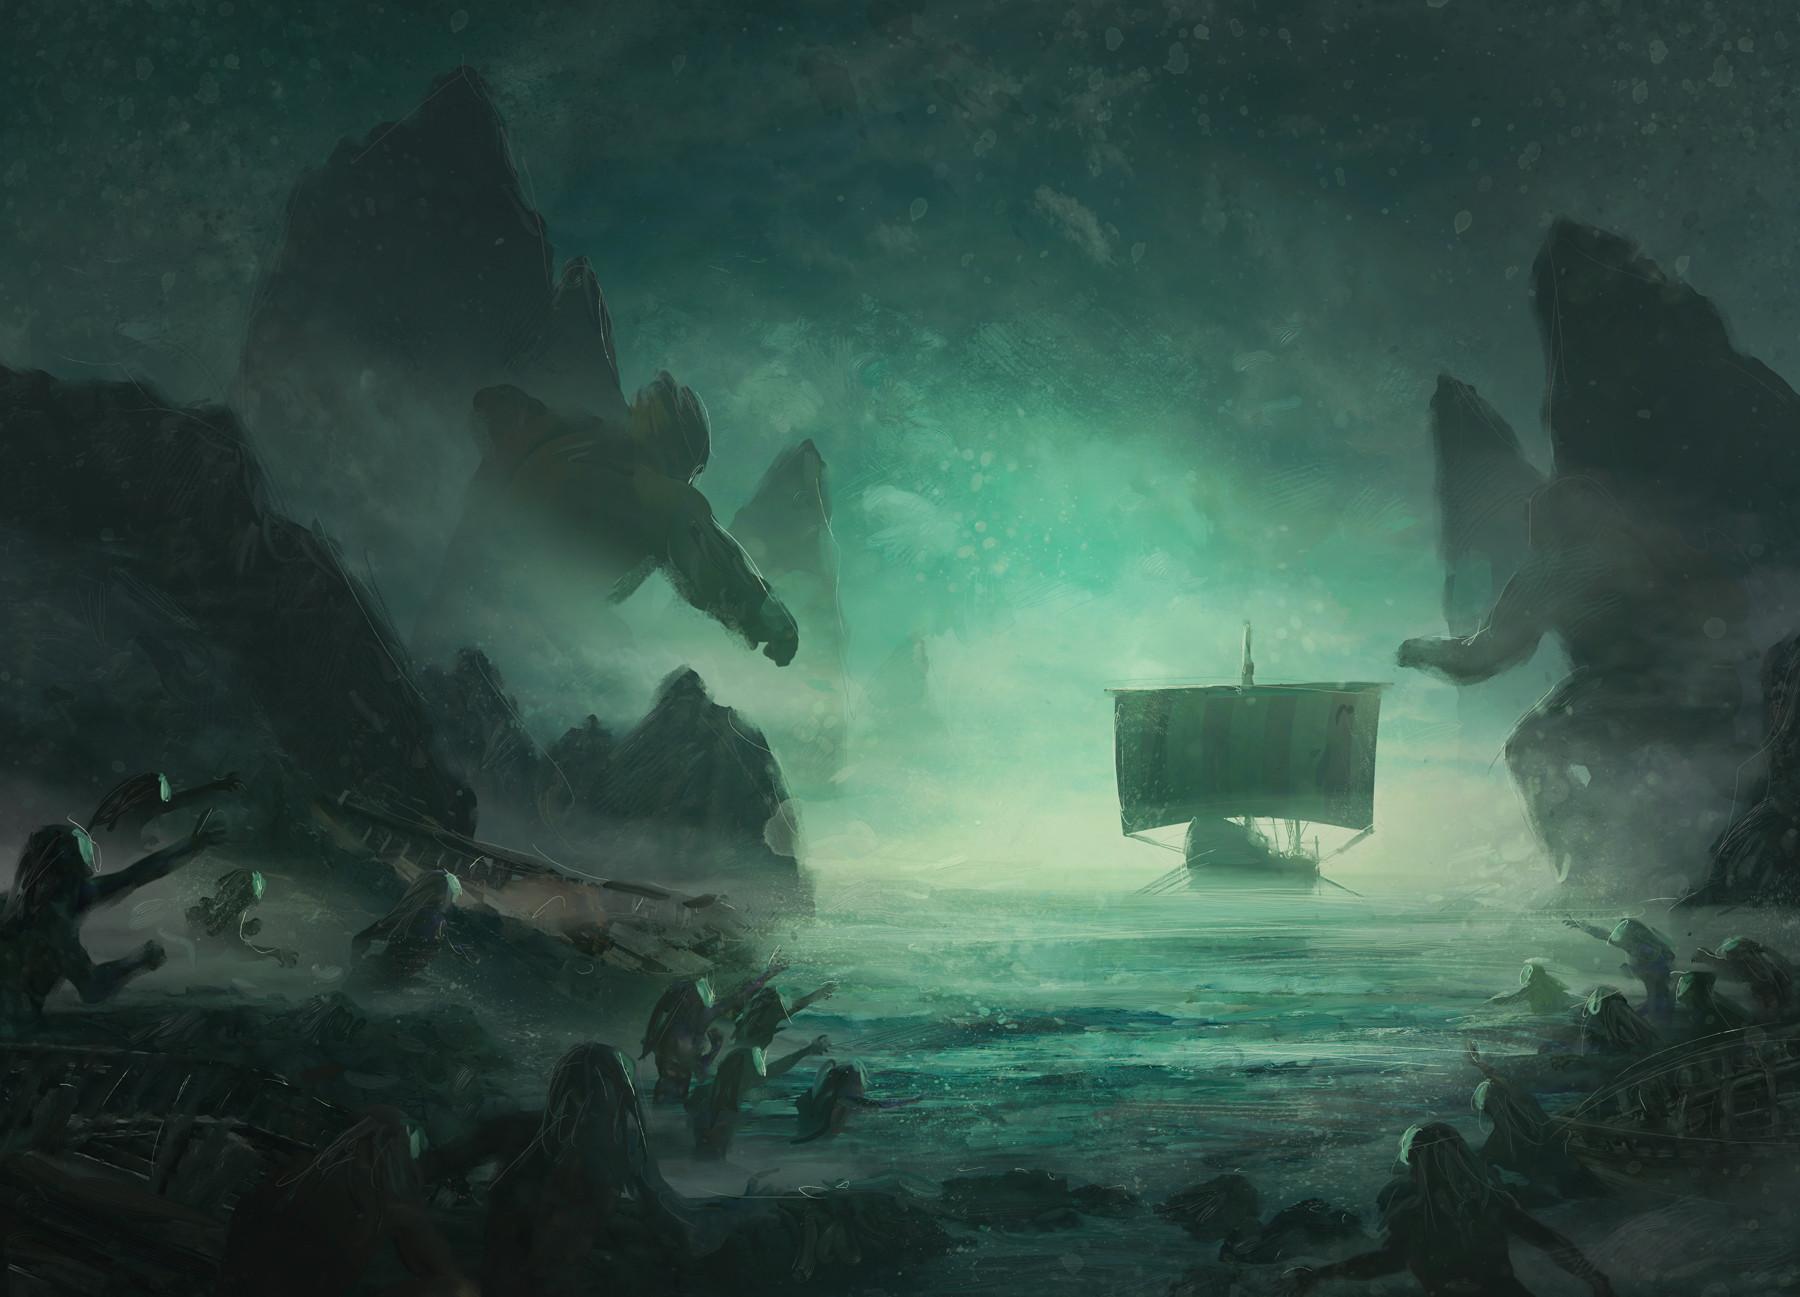 Guillem h pongiluppi board cover mythic battles poseidon concept2